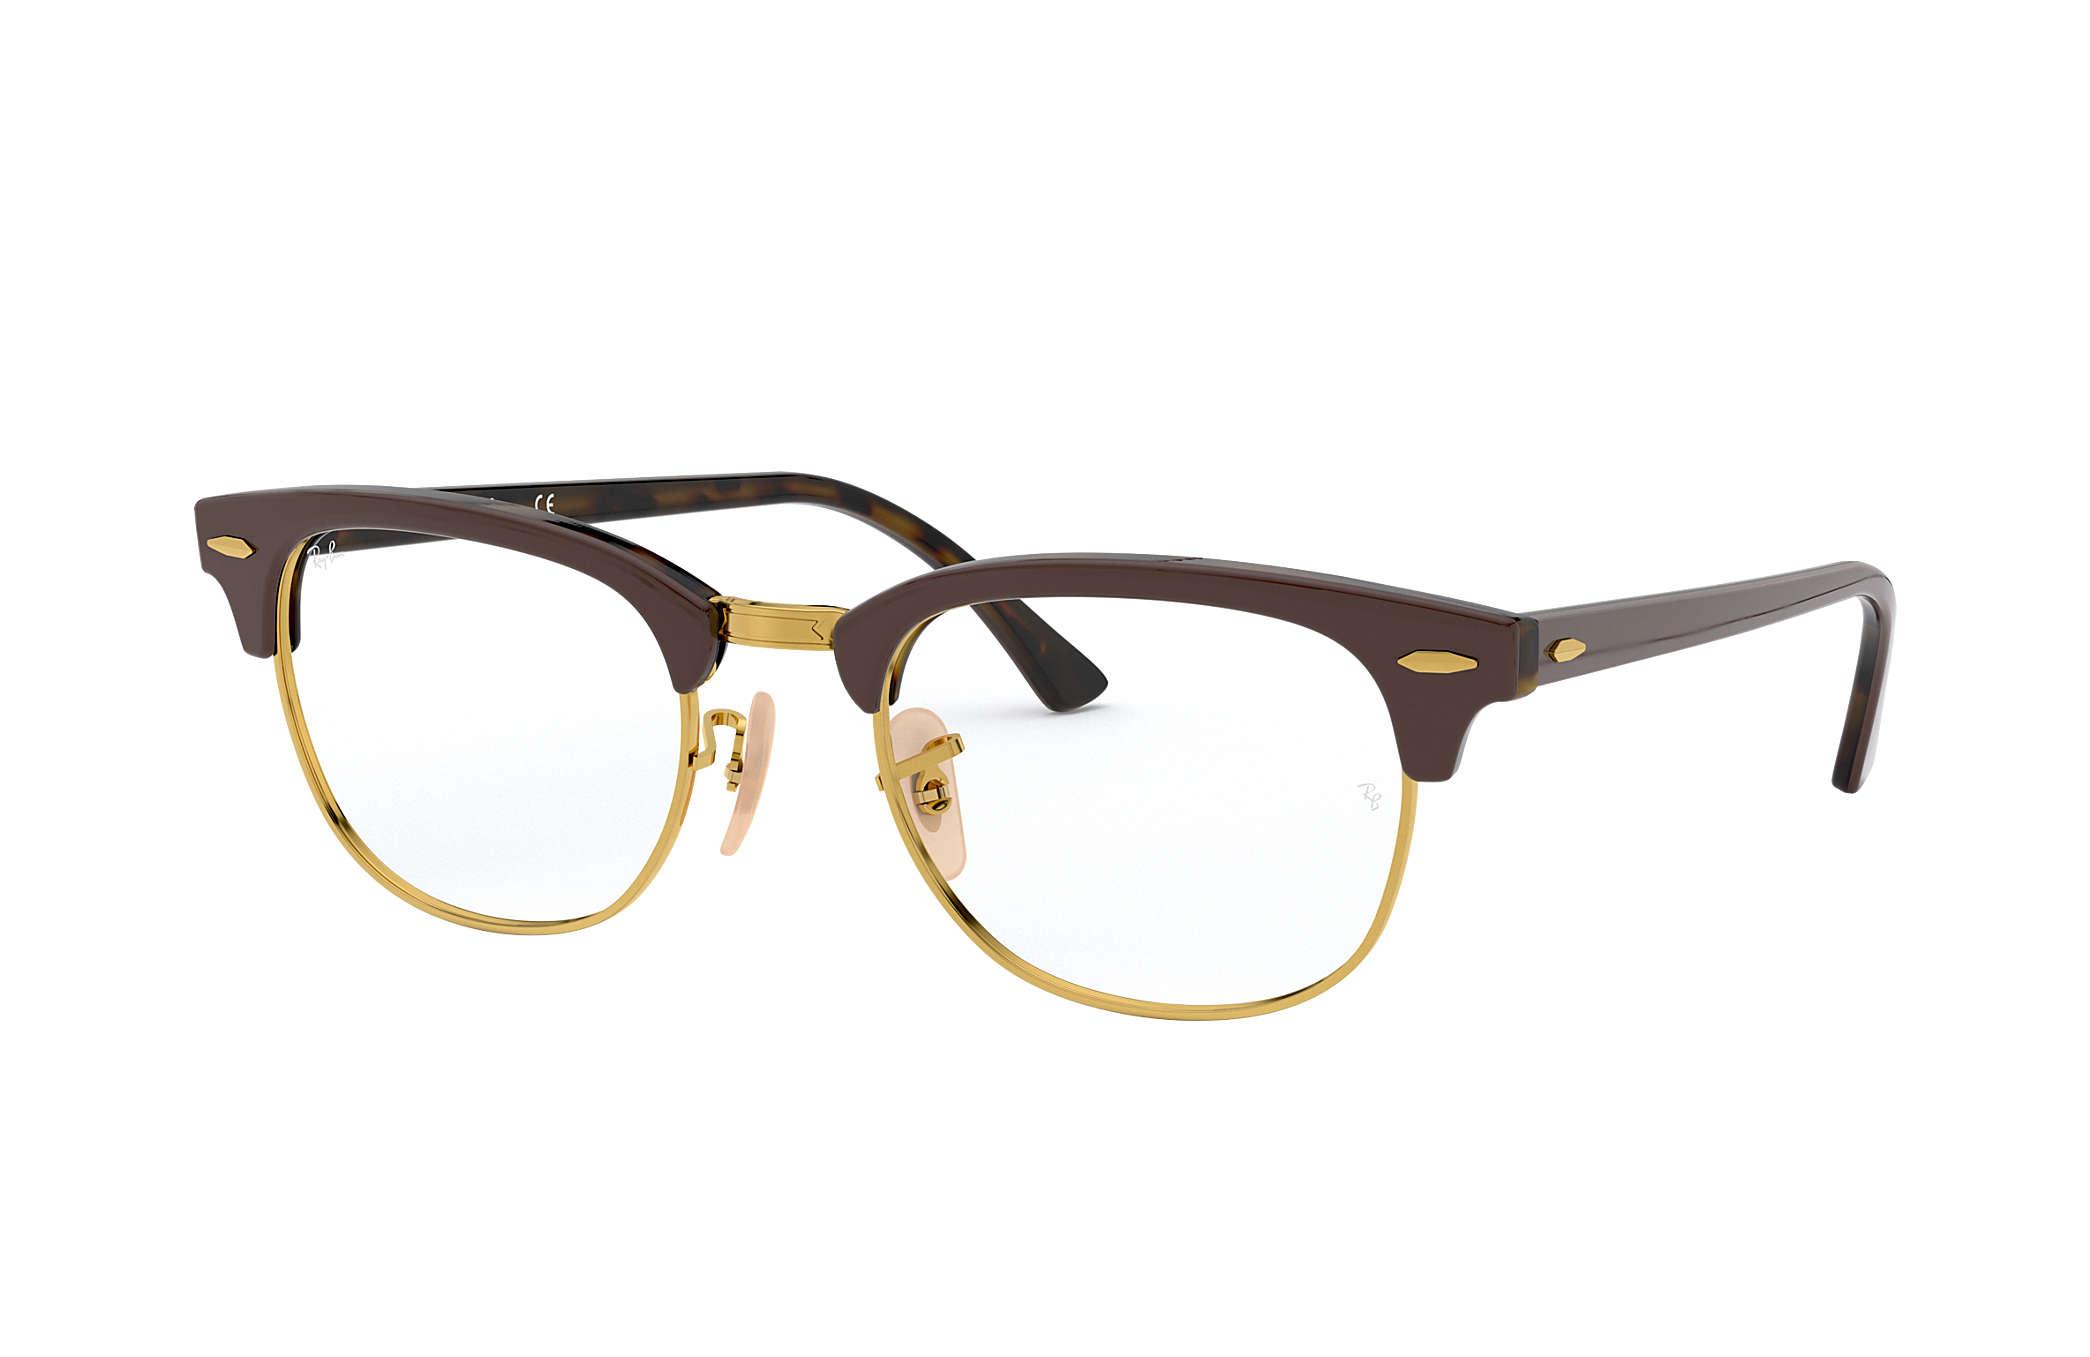 Ray Ban eyeglasses Clubmaster Optics RB5154 Brown Acetate